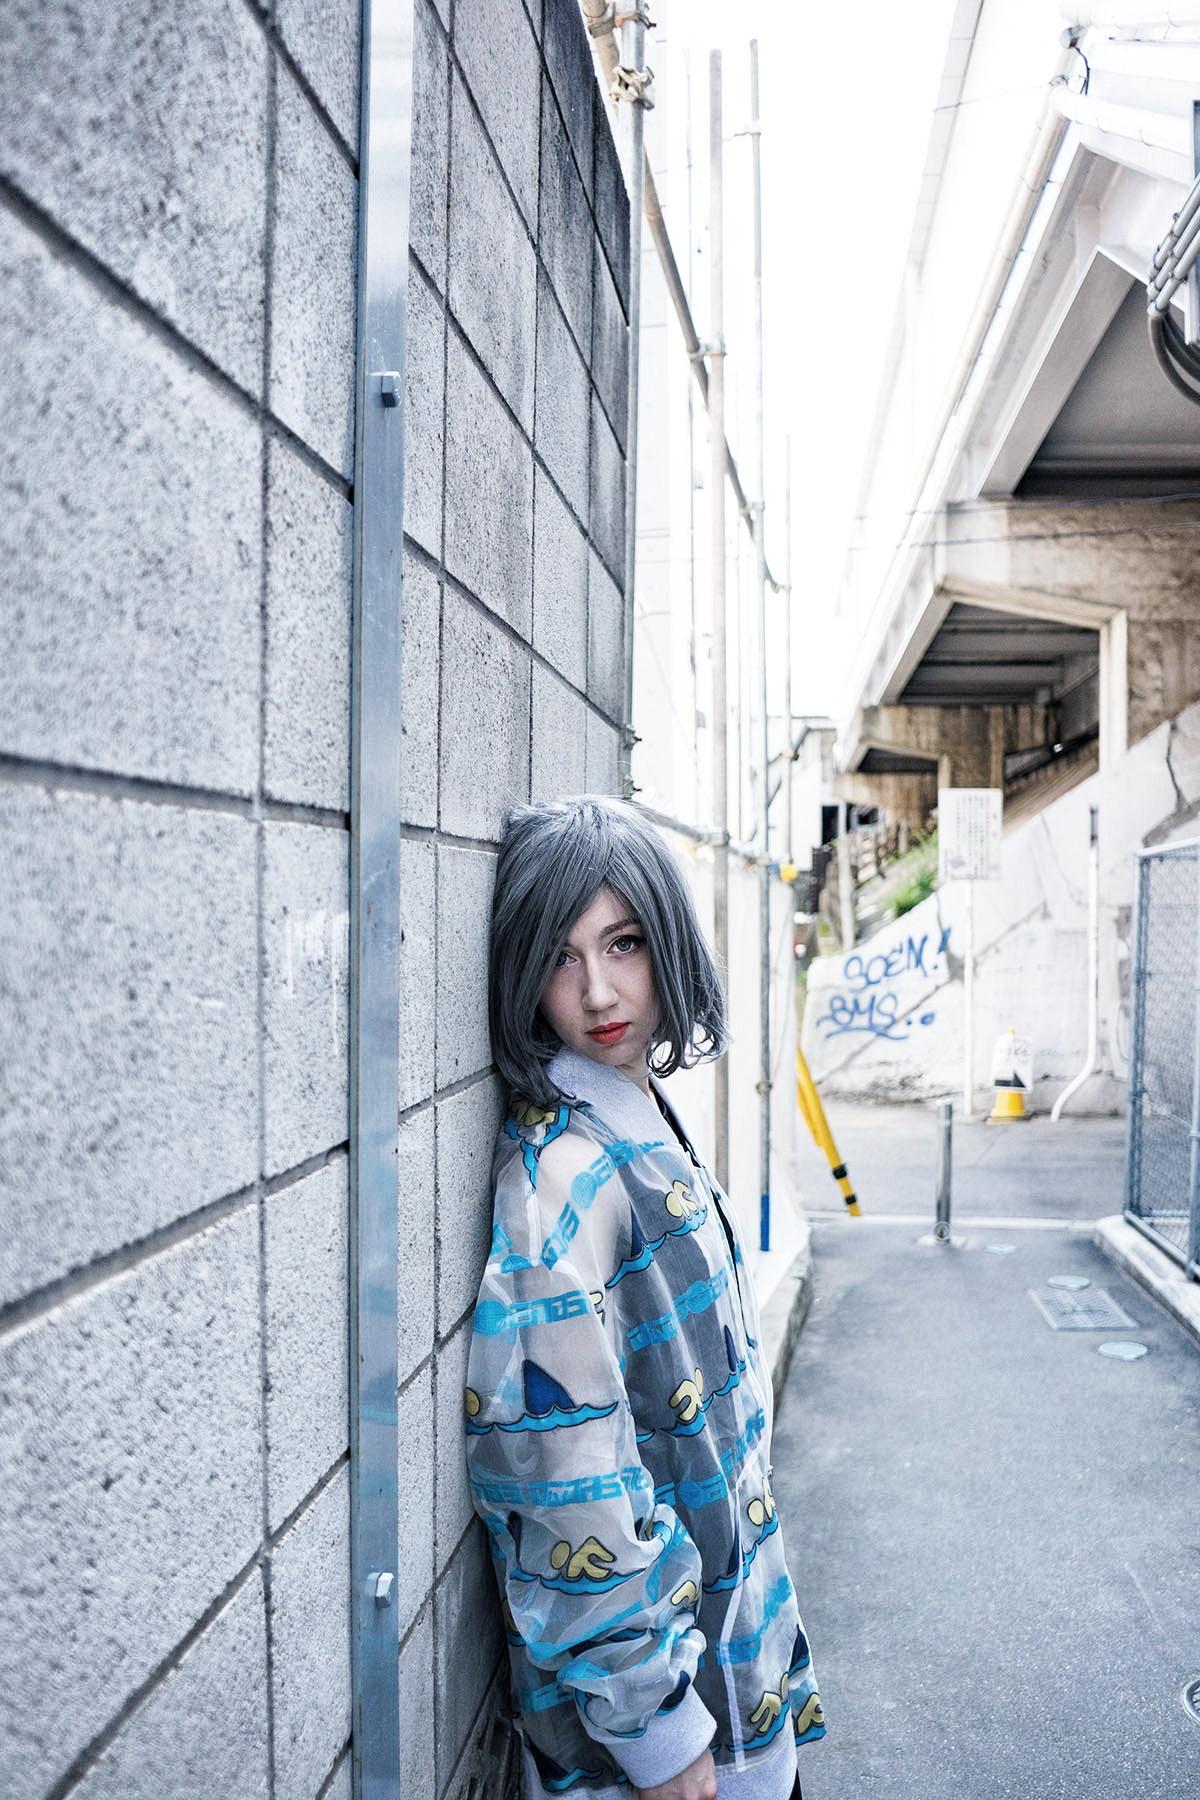 09_Snapseed